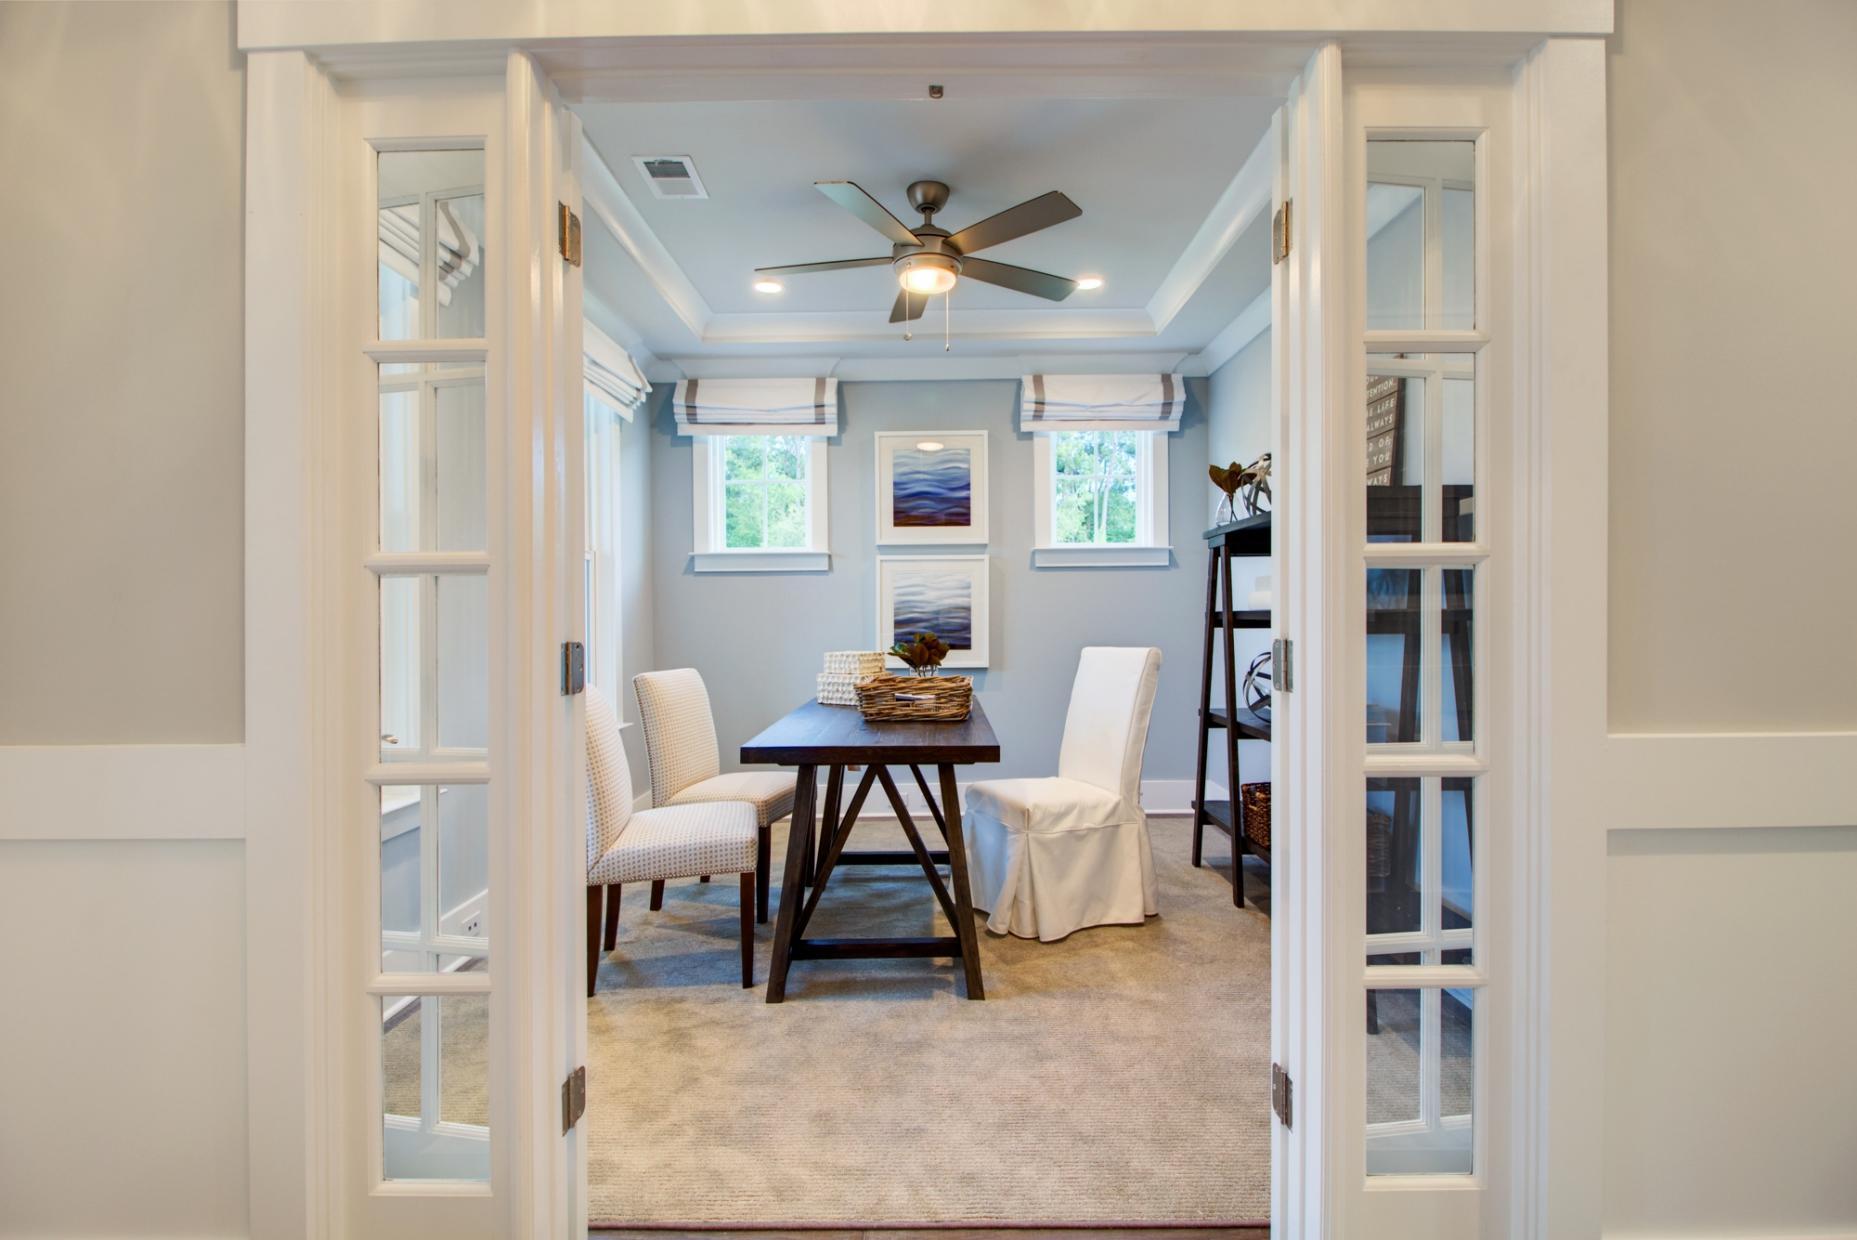 Carnes Crossroads Homes For Sale - 501 Wodin, Summerville, SC - 3